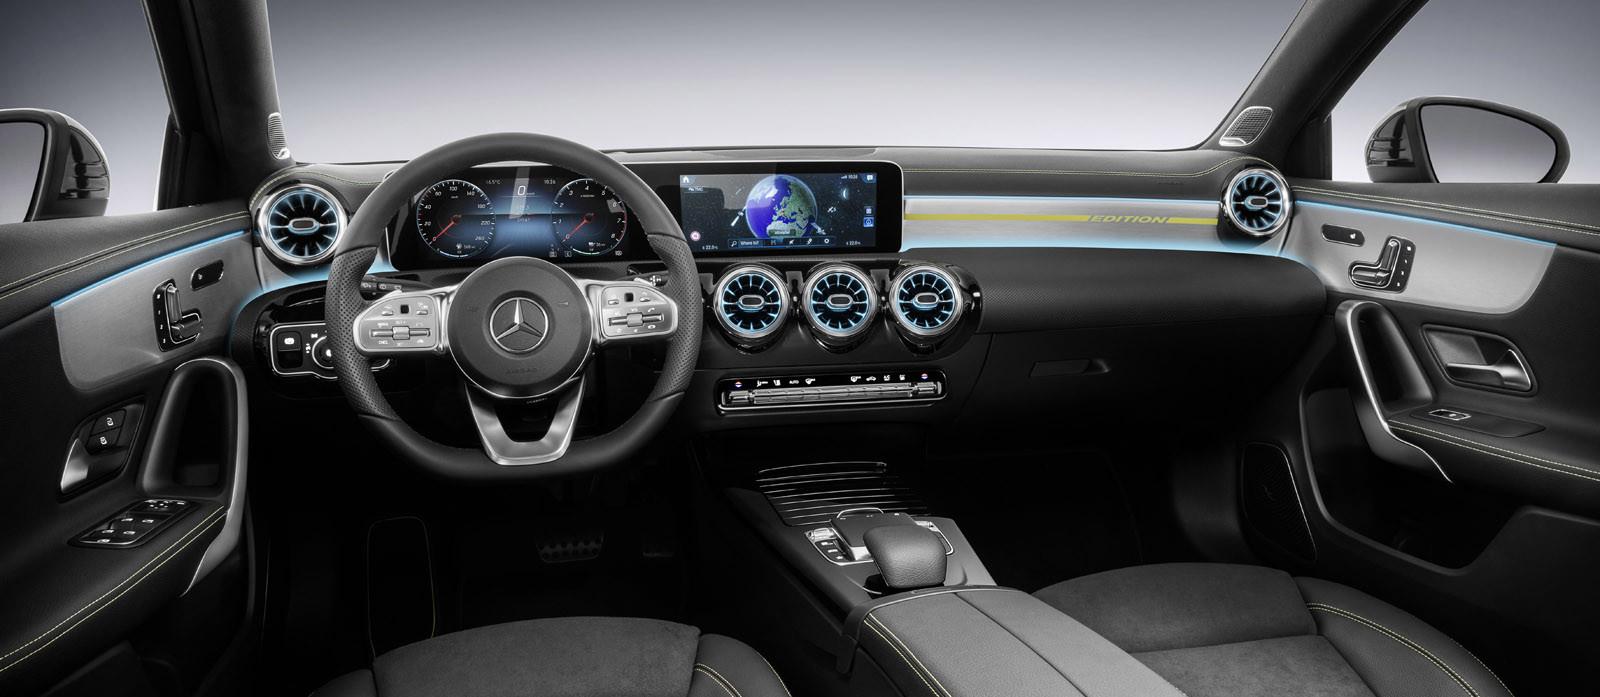 Foto de Mercedes-Benz Clase A 2018: impresiones del interior (6/28)